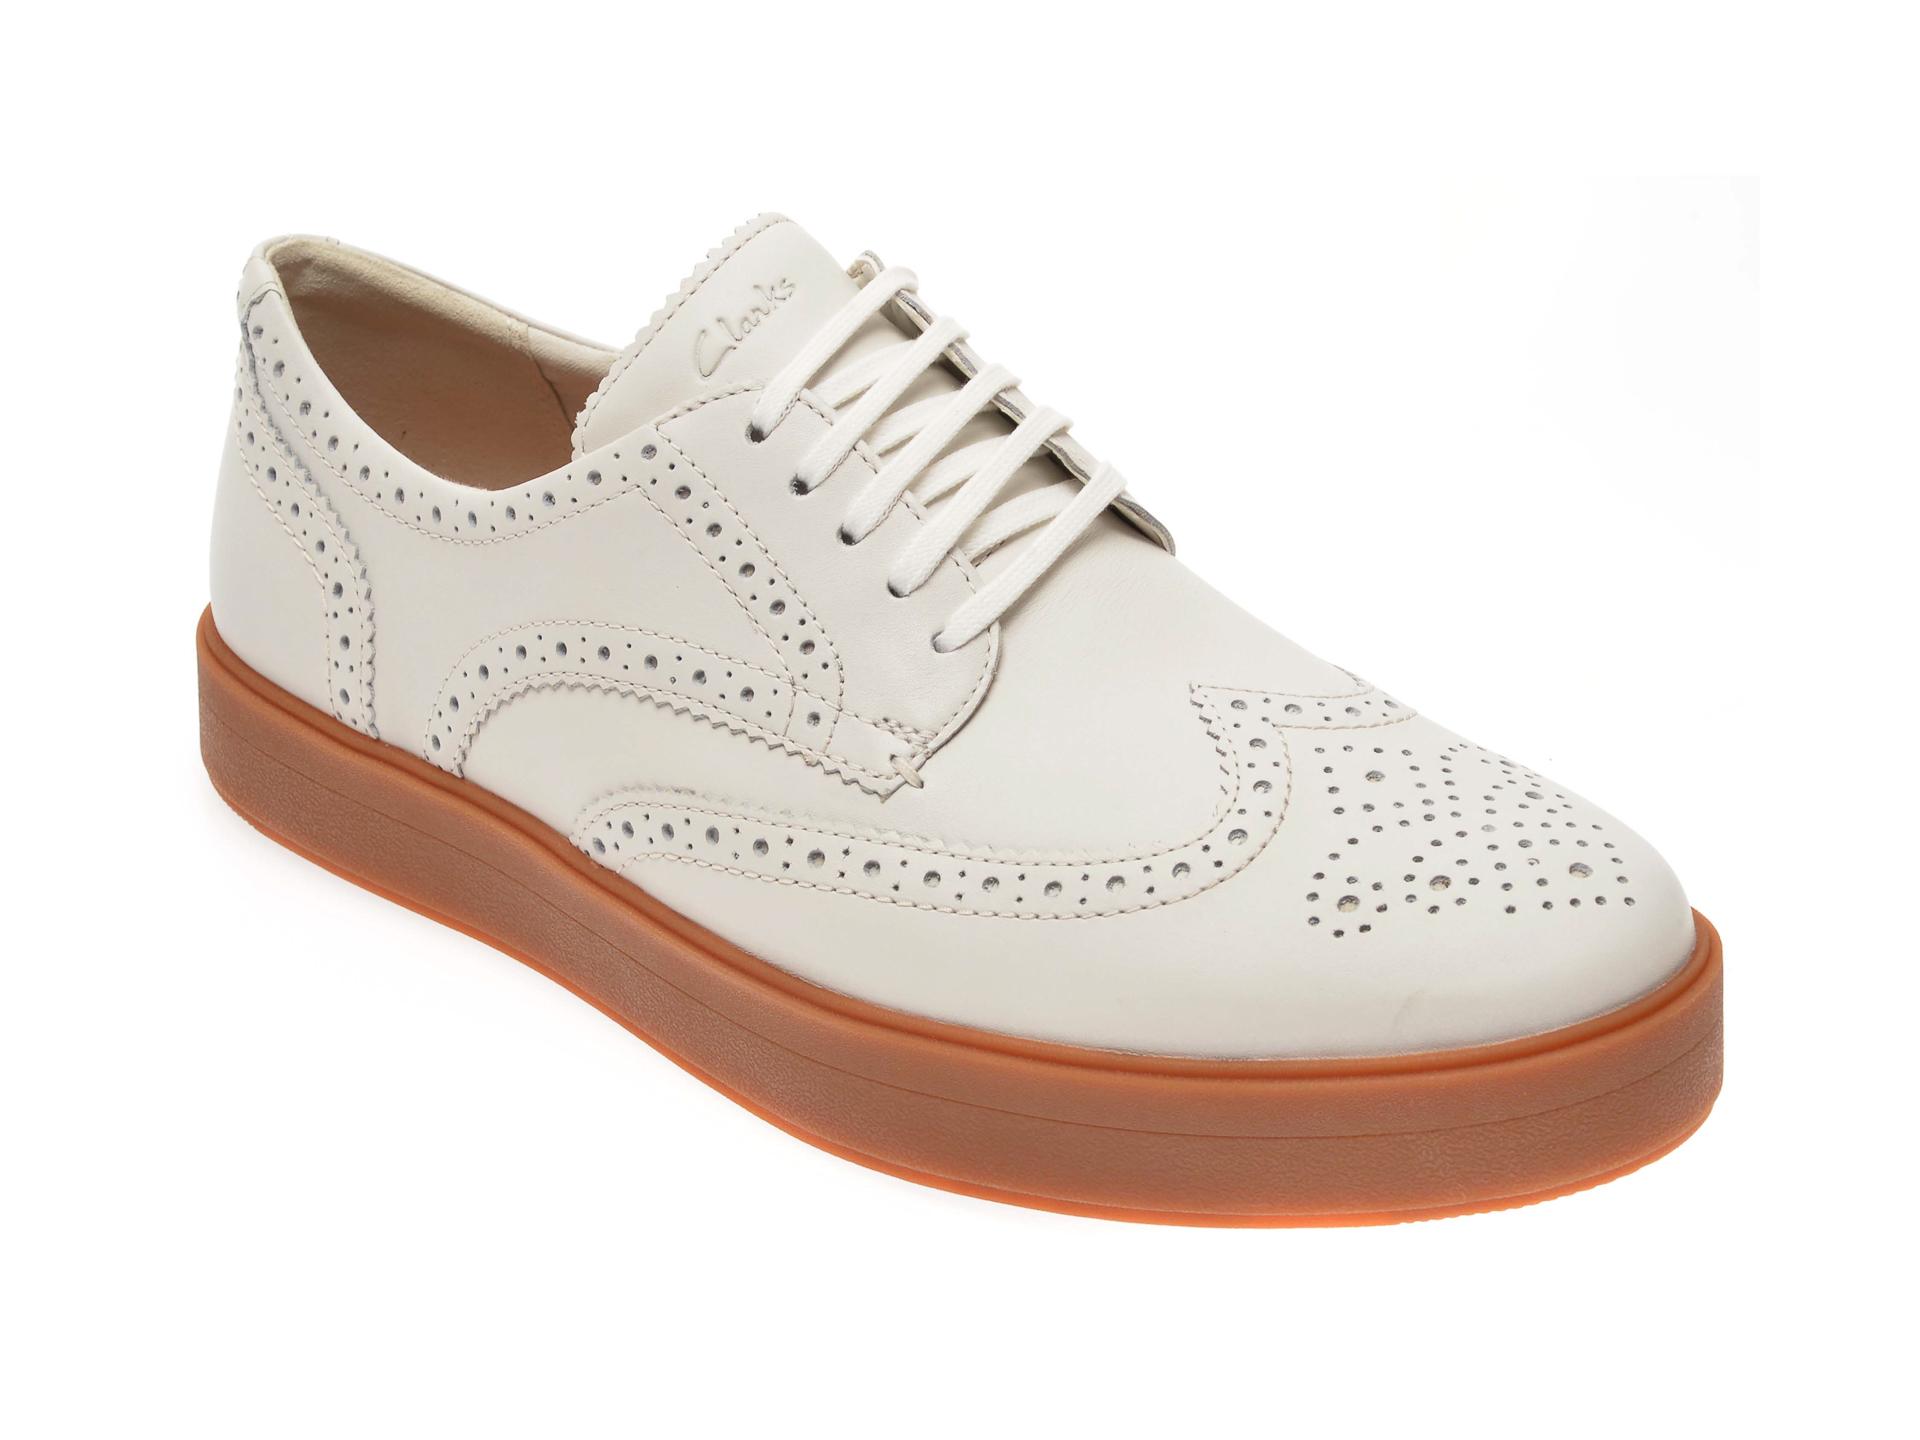 Pantofi CLARKS albi, Hero Limit, din piele naturala imagine